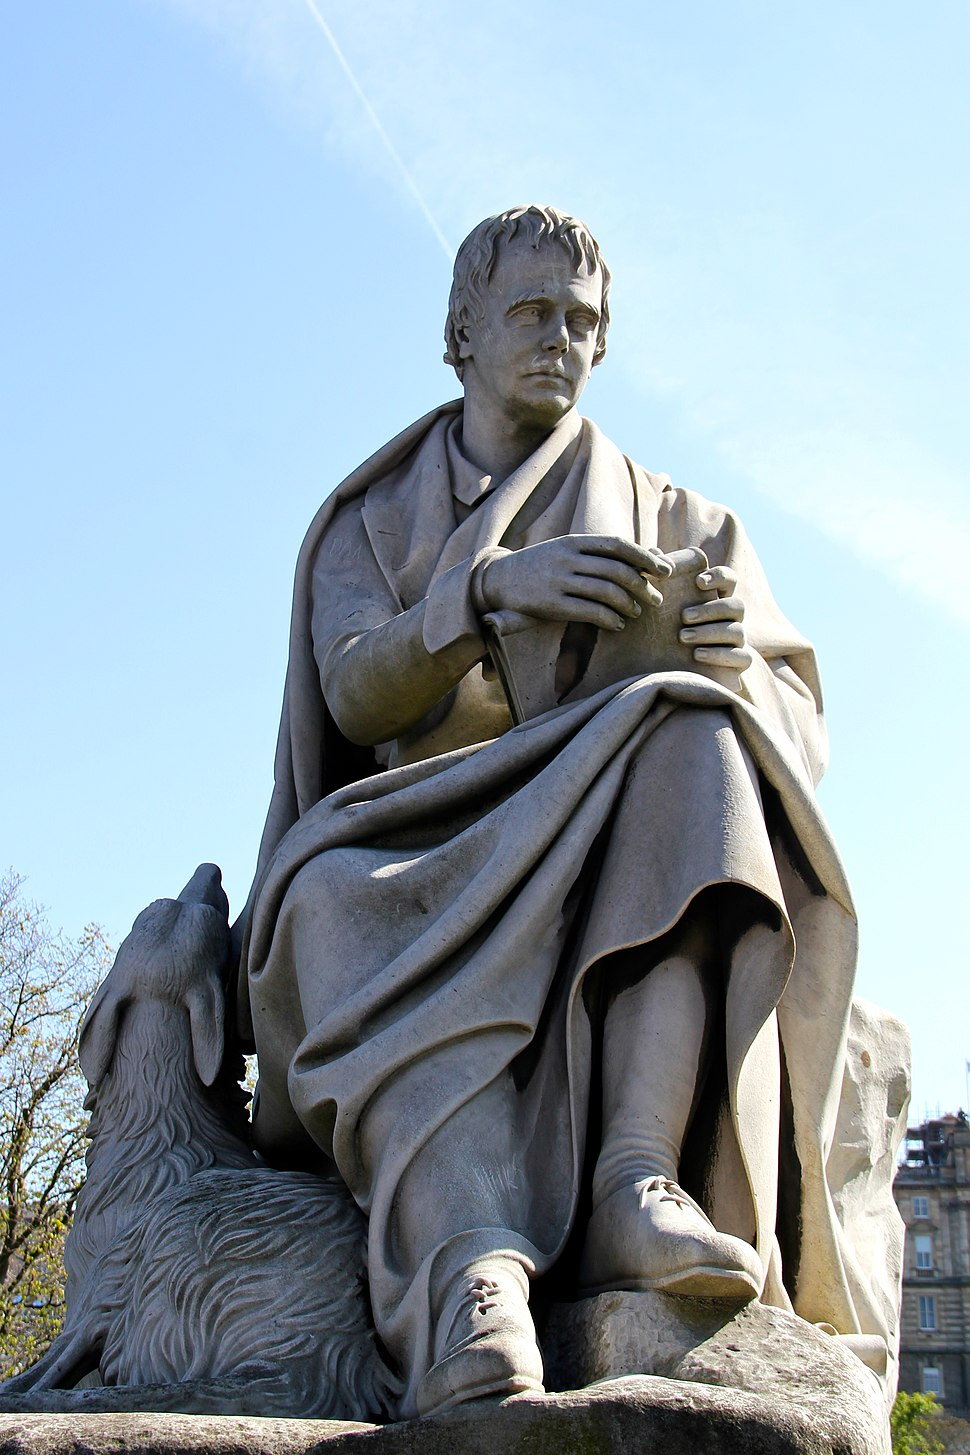 Sir Walter Scott statue at Scott Monument